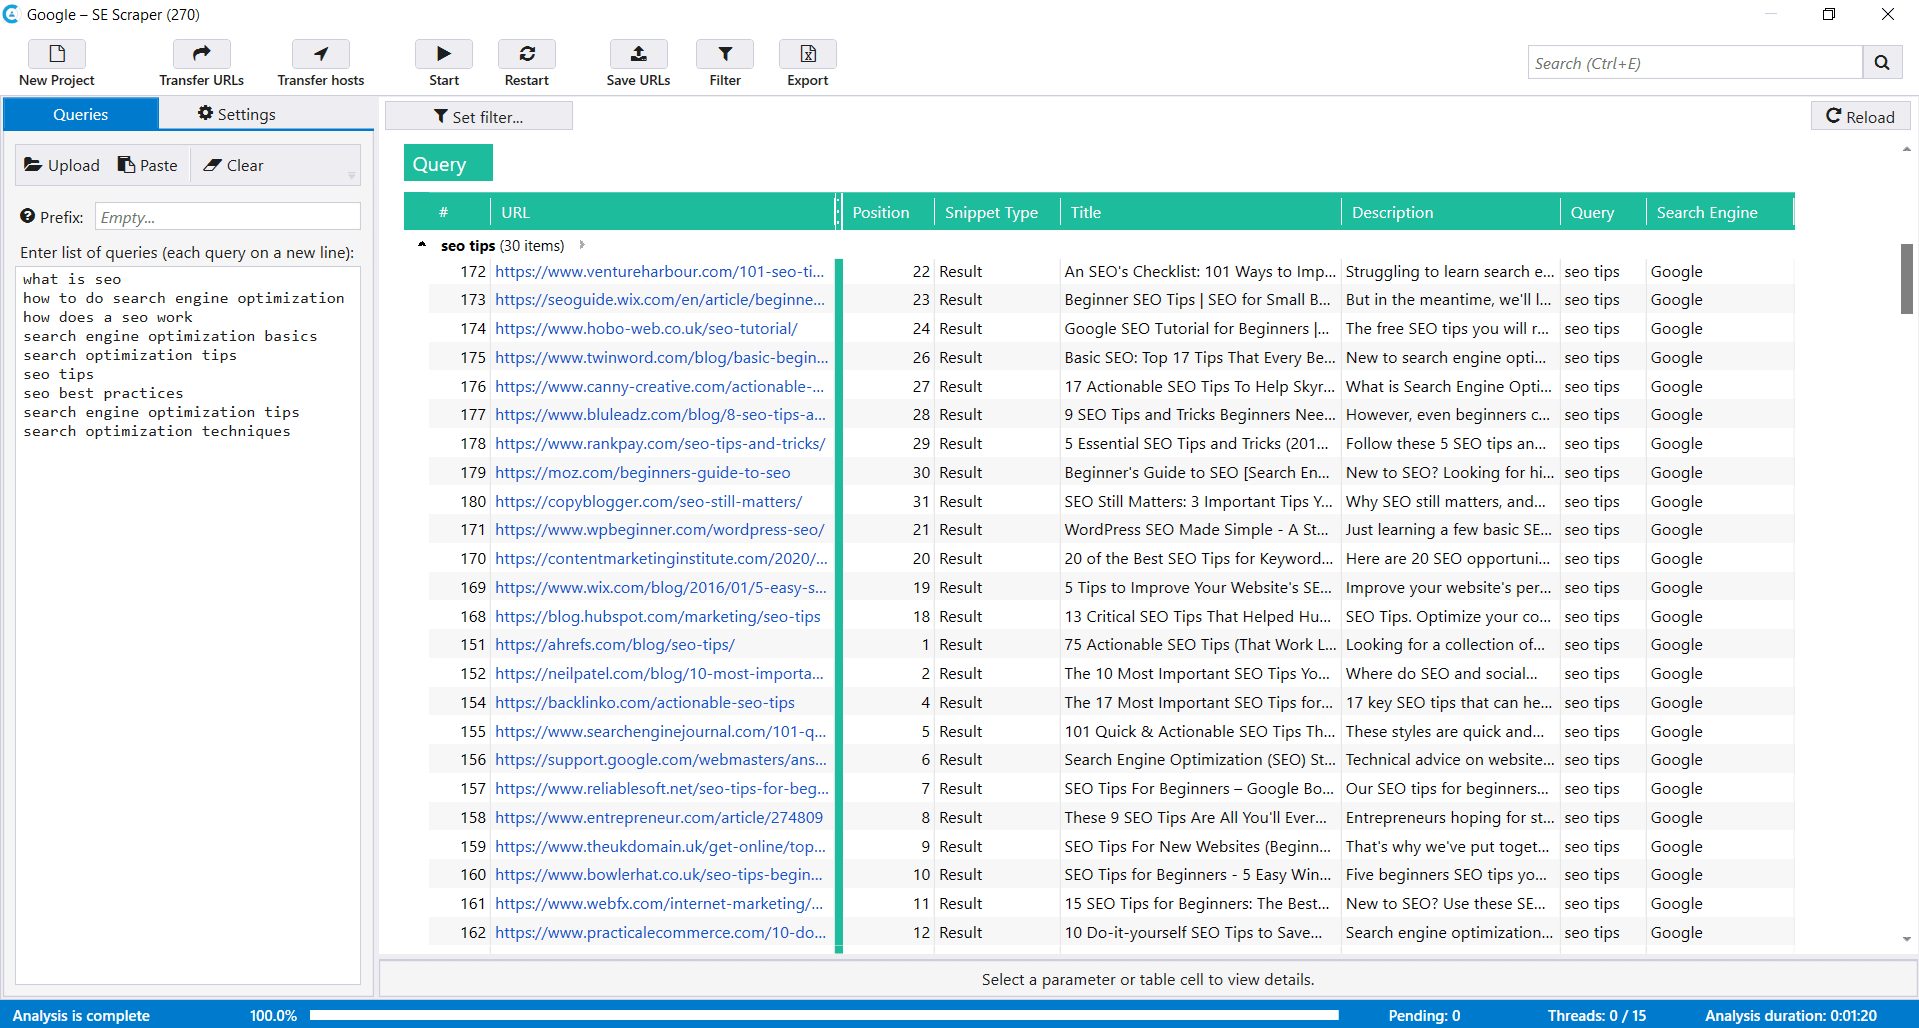 Scraping results in Netpeak Checker